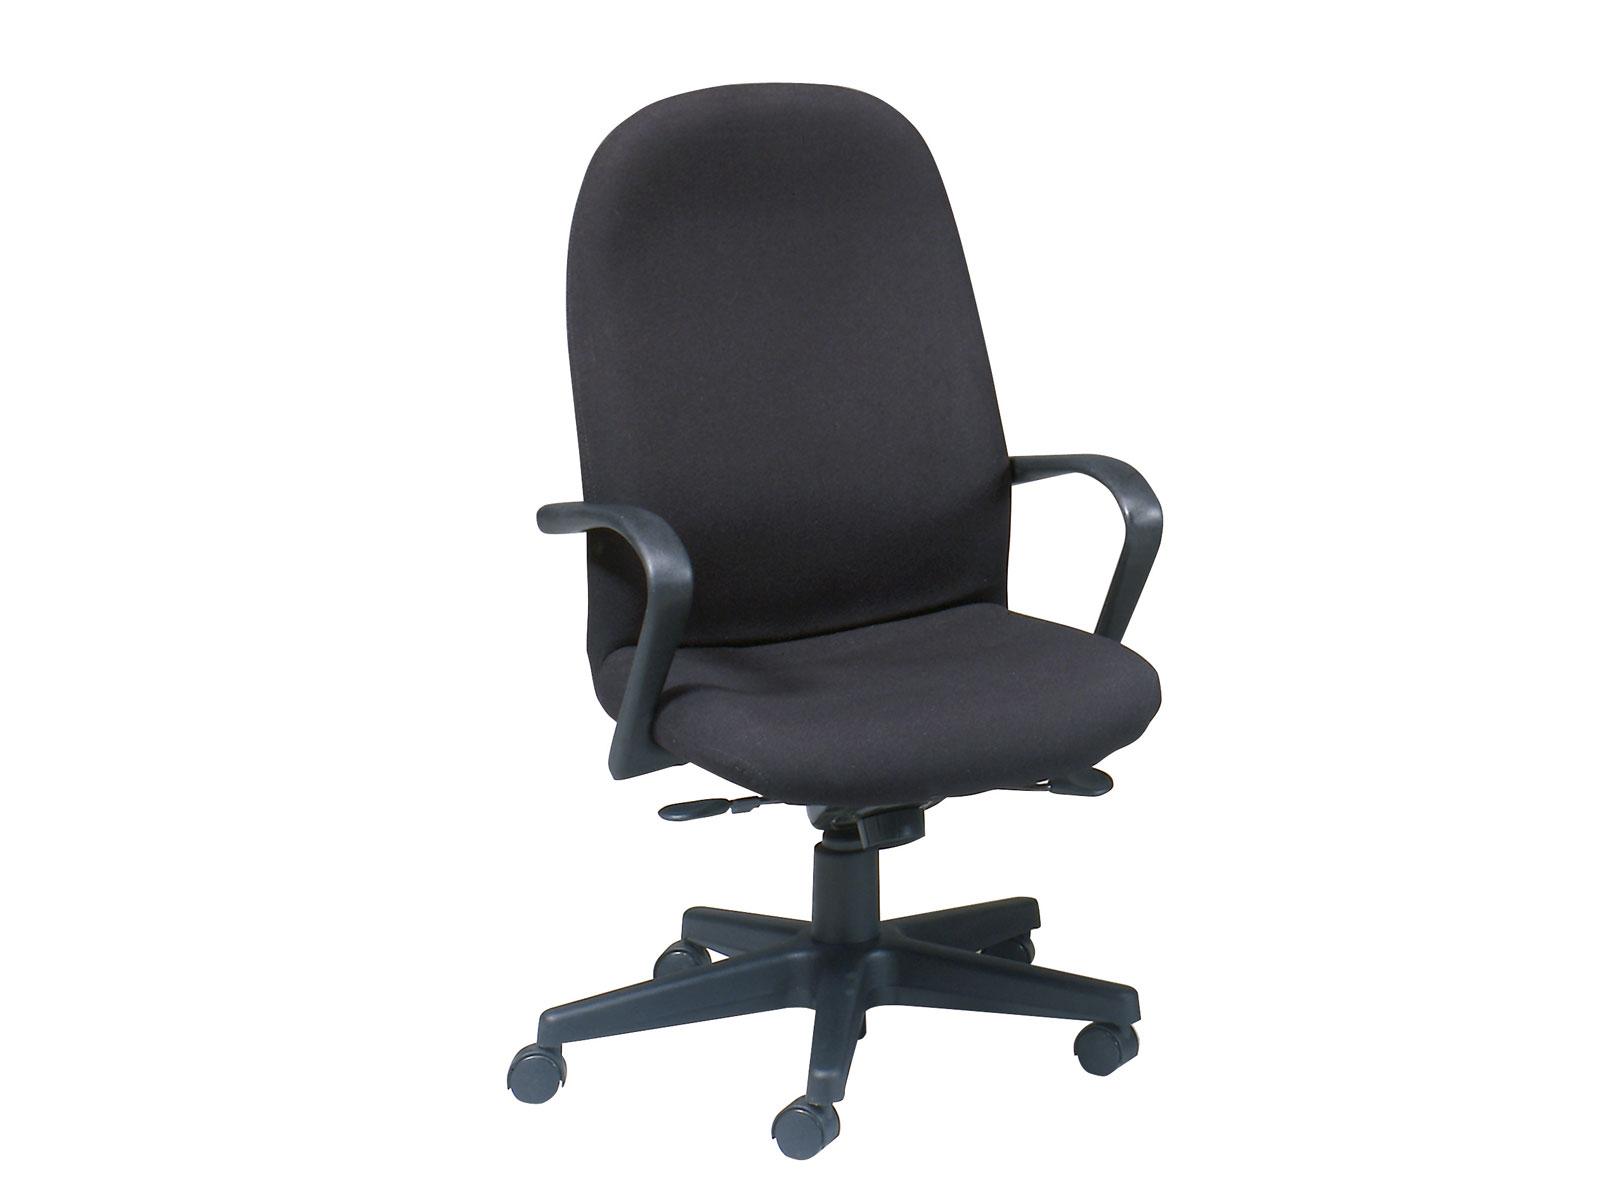 office furniture trade shows. Altura Executive Chair -- Trade Show Rental Furniture Office Shows